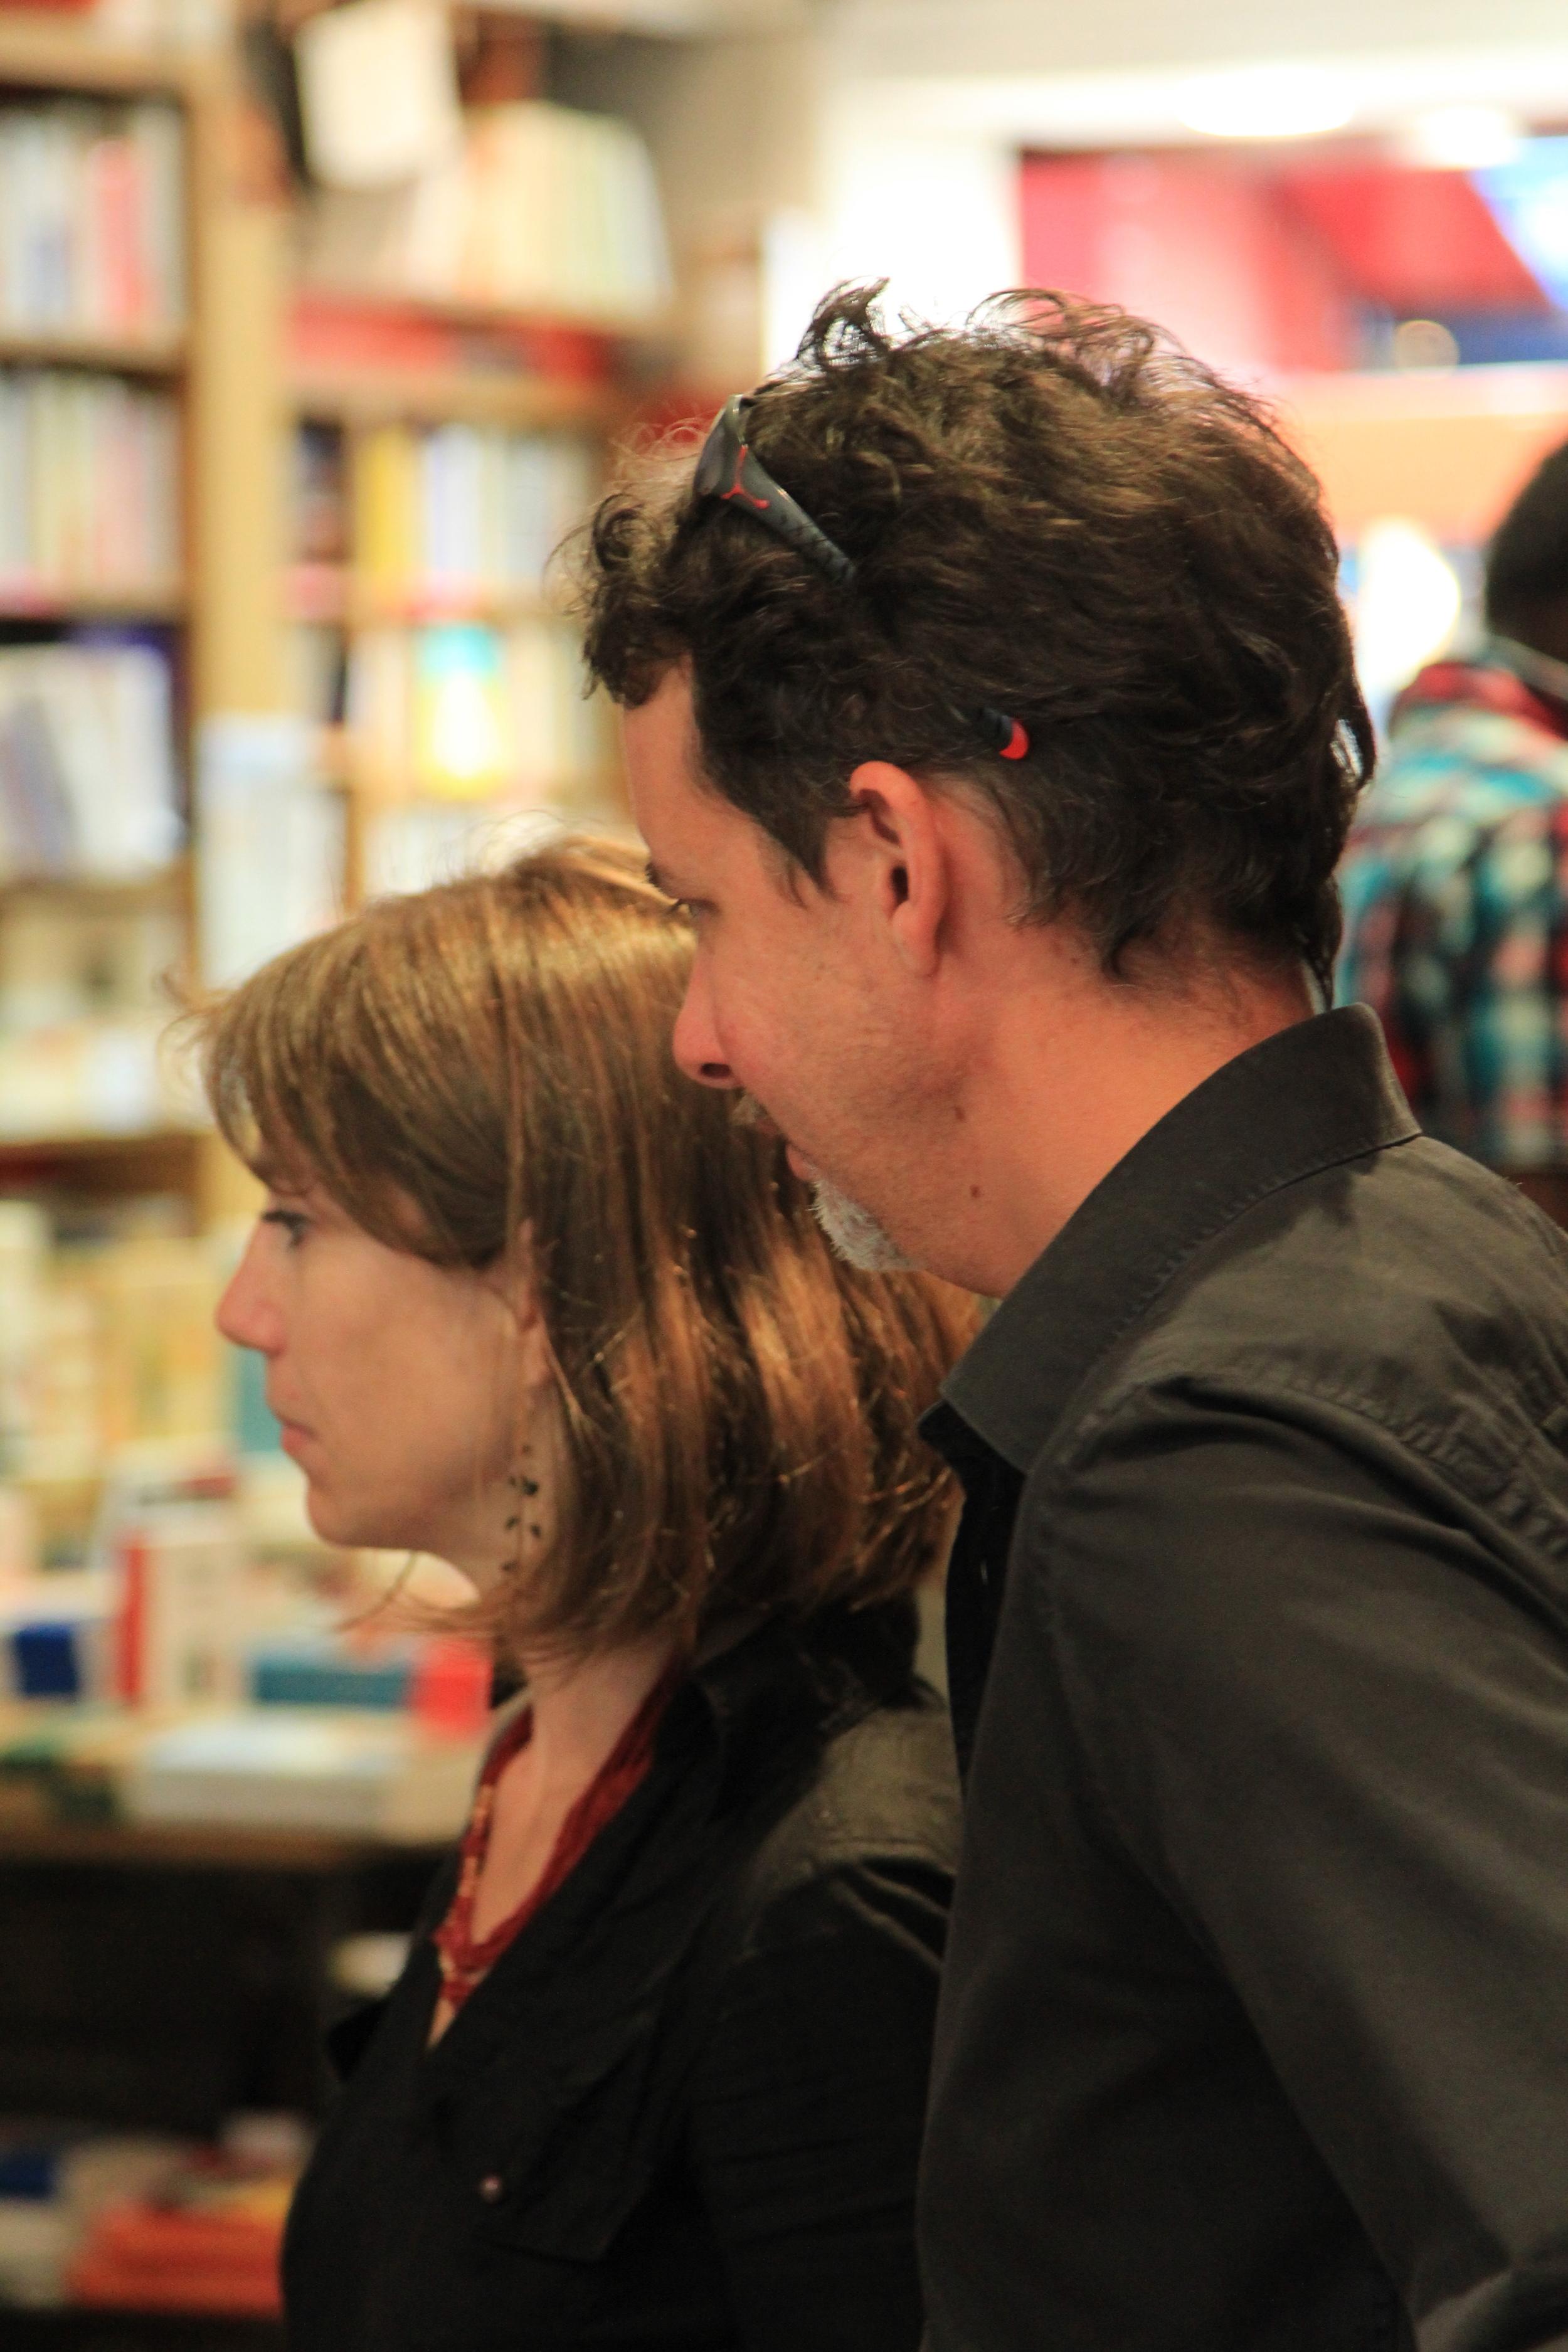 Spectators at Le comptoir des mots. Photo: Dan Gunn.